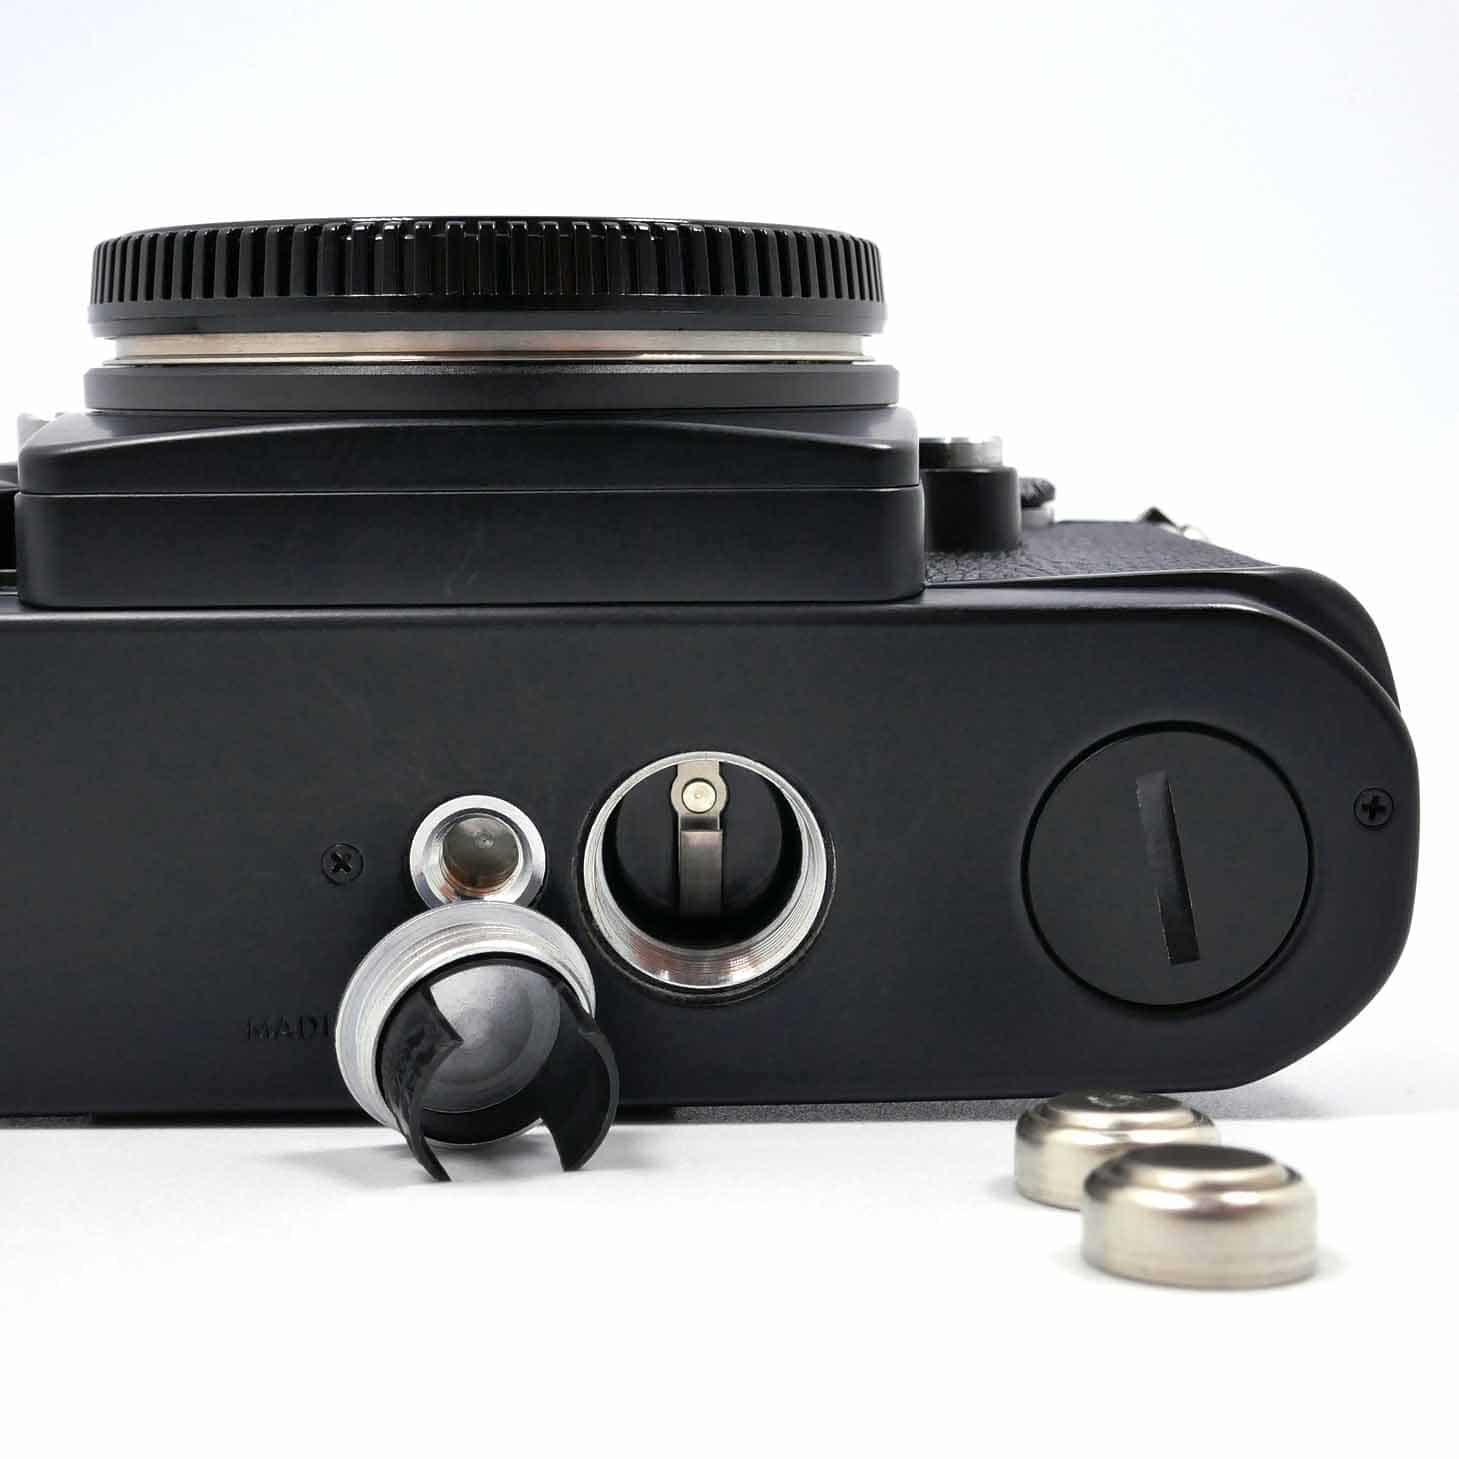 clean-cameras-Nikon-F3-Body-mint--09